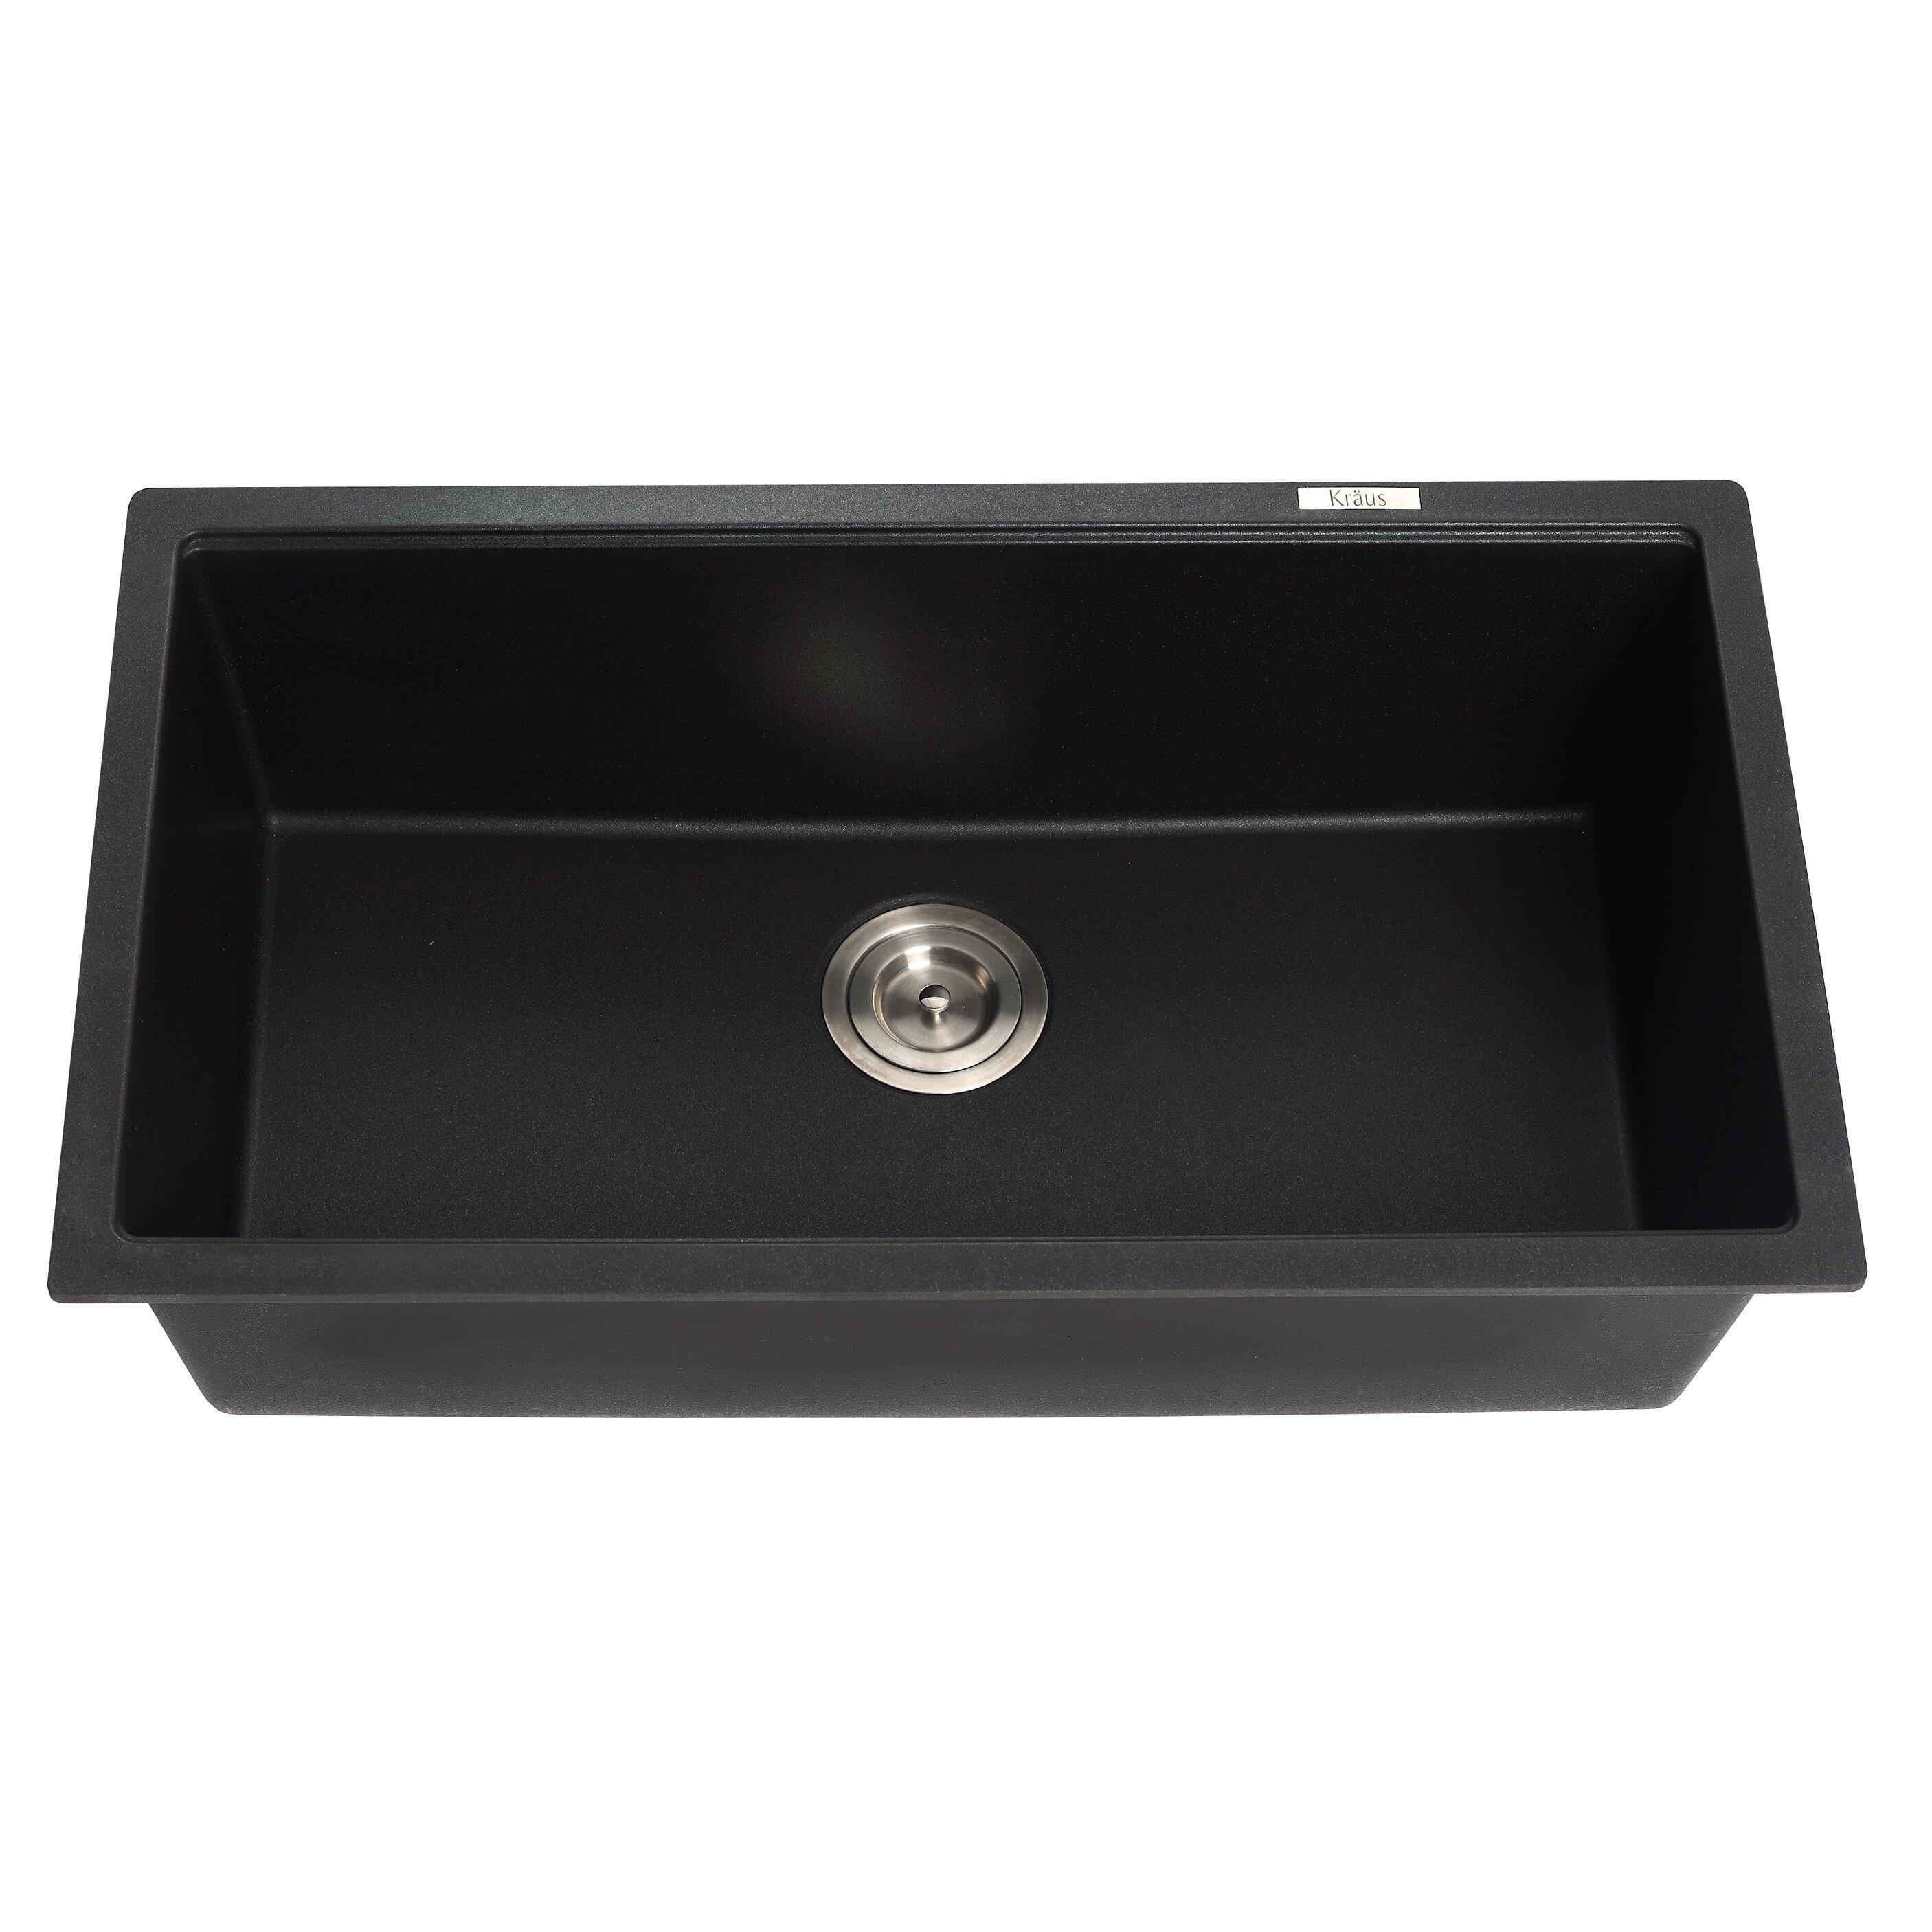 Kraus 31 X Undermount Single Bowl Granite Kitchen Sink Reviews Wayfair